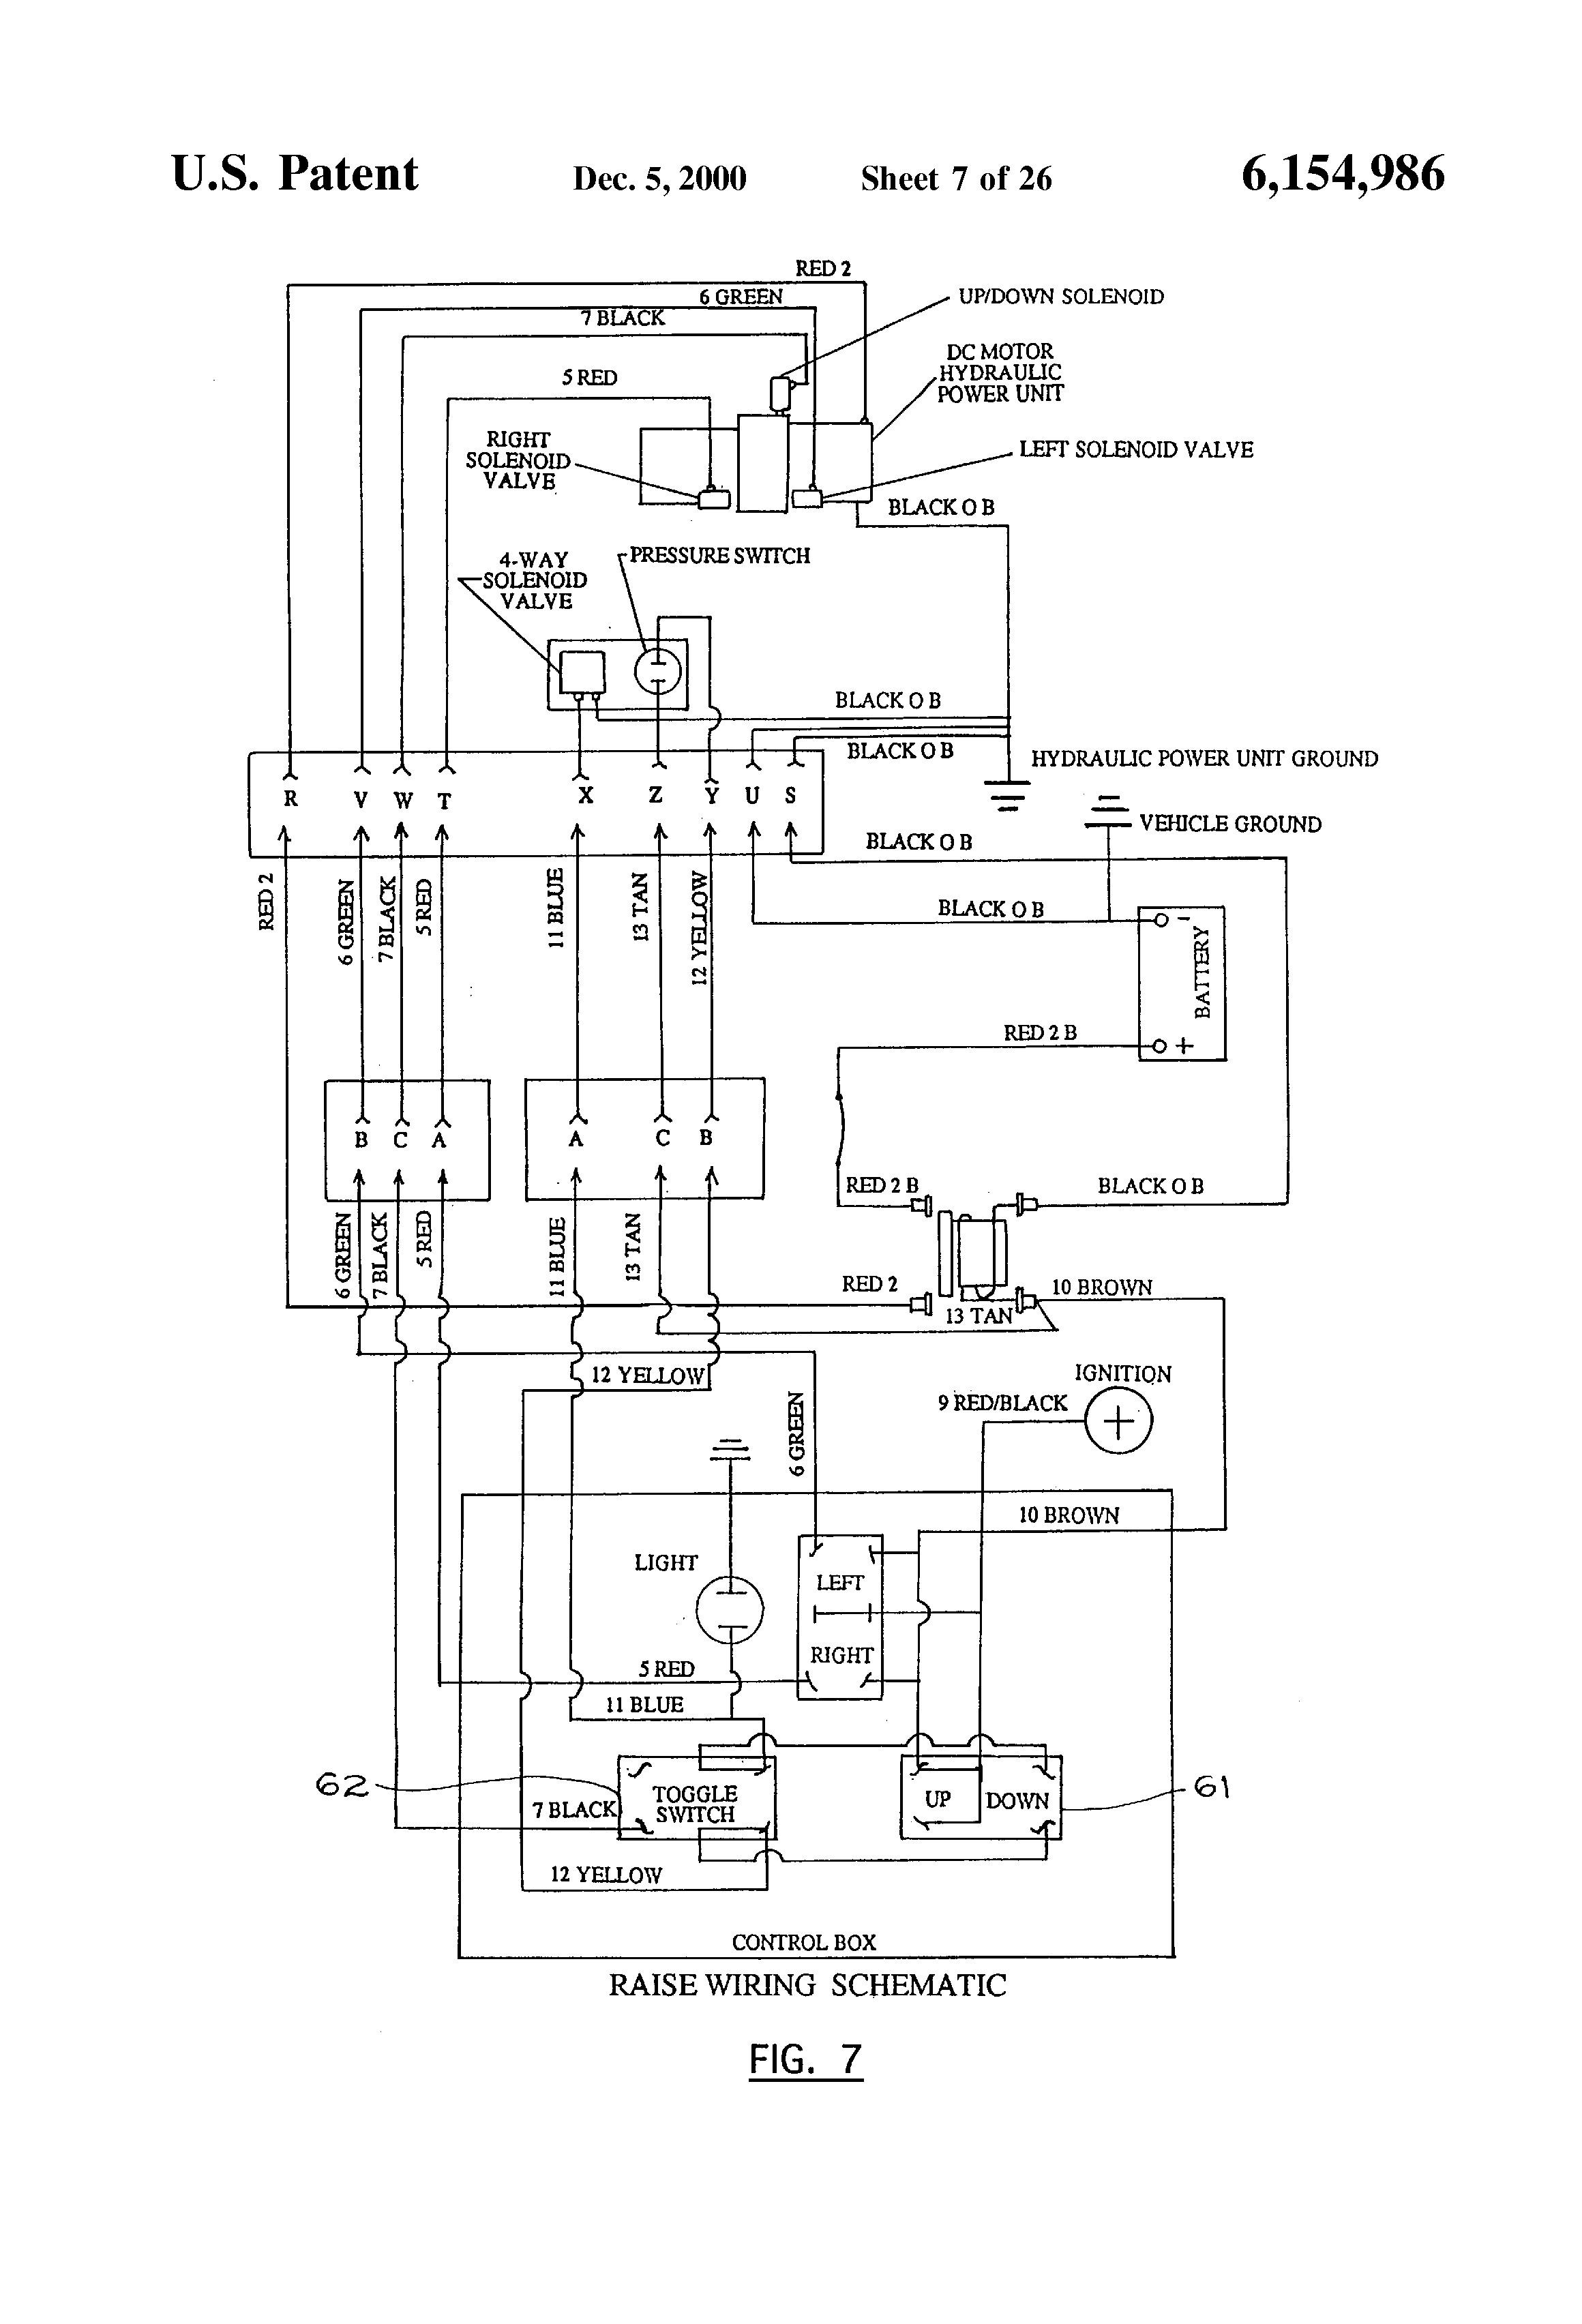 WIRING Chevy Western Plow Wiring Diagram Rev 9 FULL Version HD Quality Rev  9 - OKCWEBDESIGNER.KINGGO.FR okcwebdesigner kinggo fr